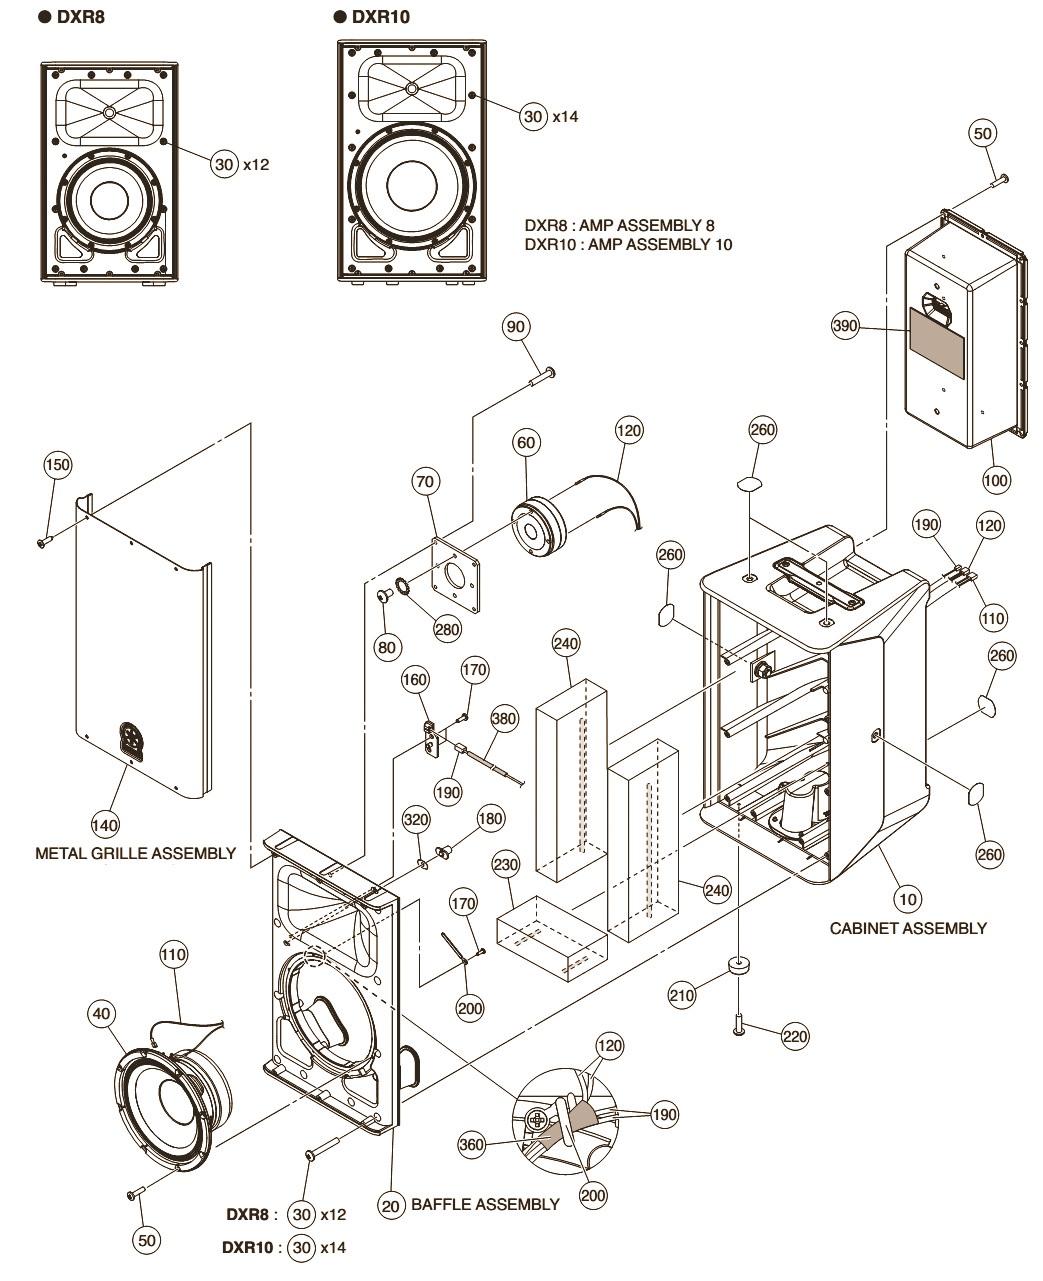 Schematic Diagrams Yamaha Dxr8 Dxr10 Dxr12 Dxr15